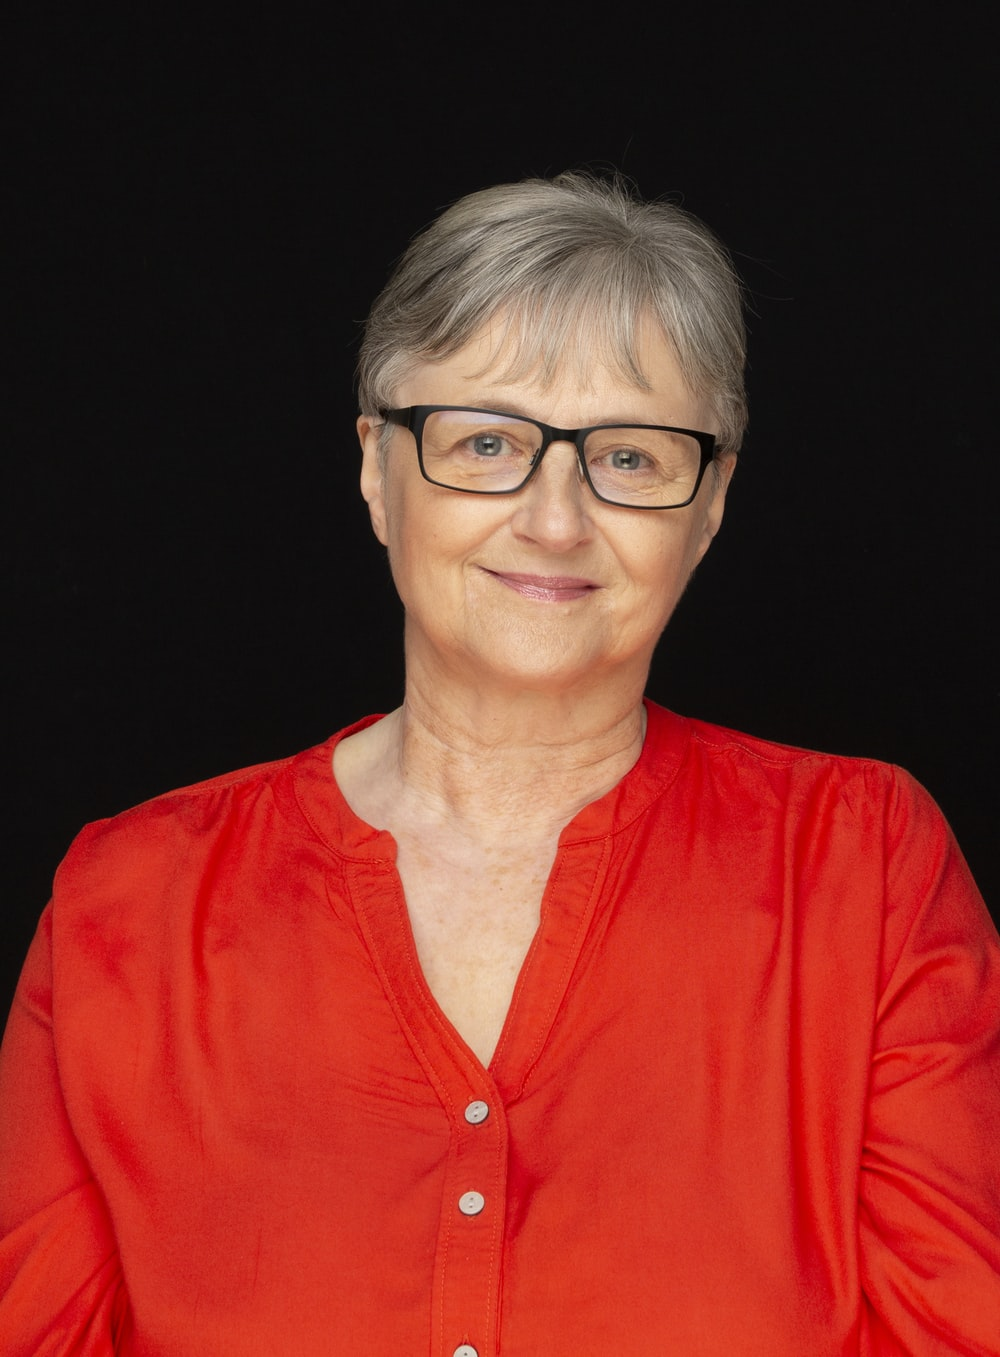 woman in red shirt wearing eyeglasses